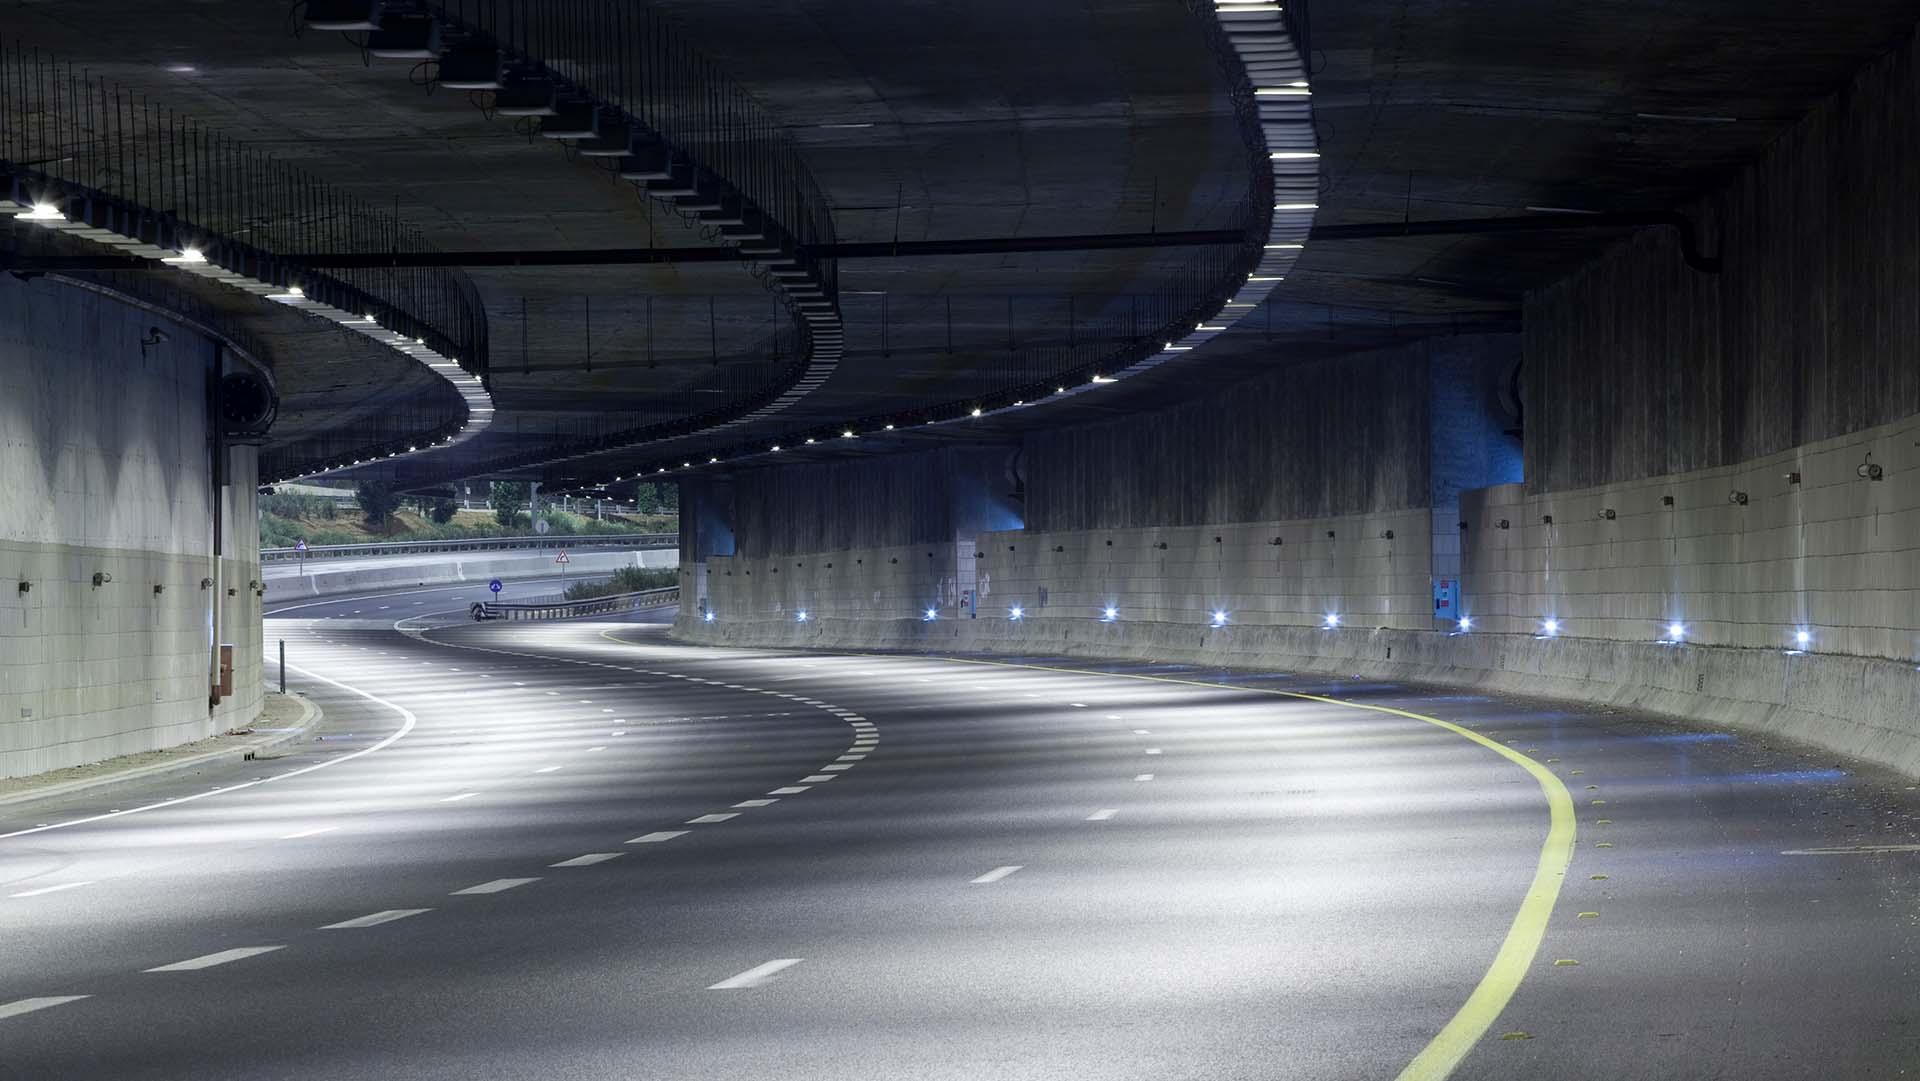 Mc4 Construction, LLC: Traffic Signals, Street Lights and Sports Lighting in Nevada